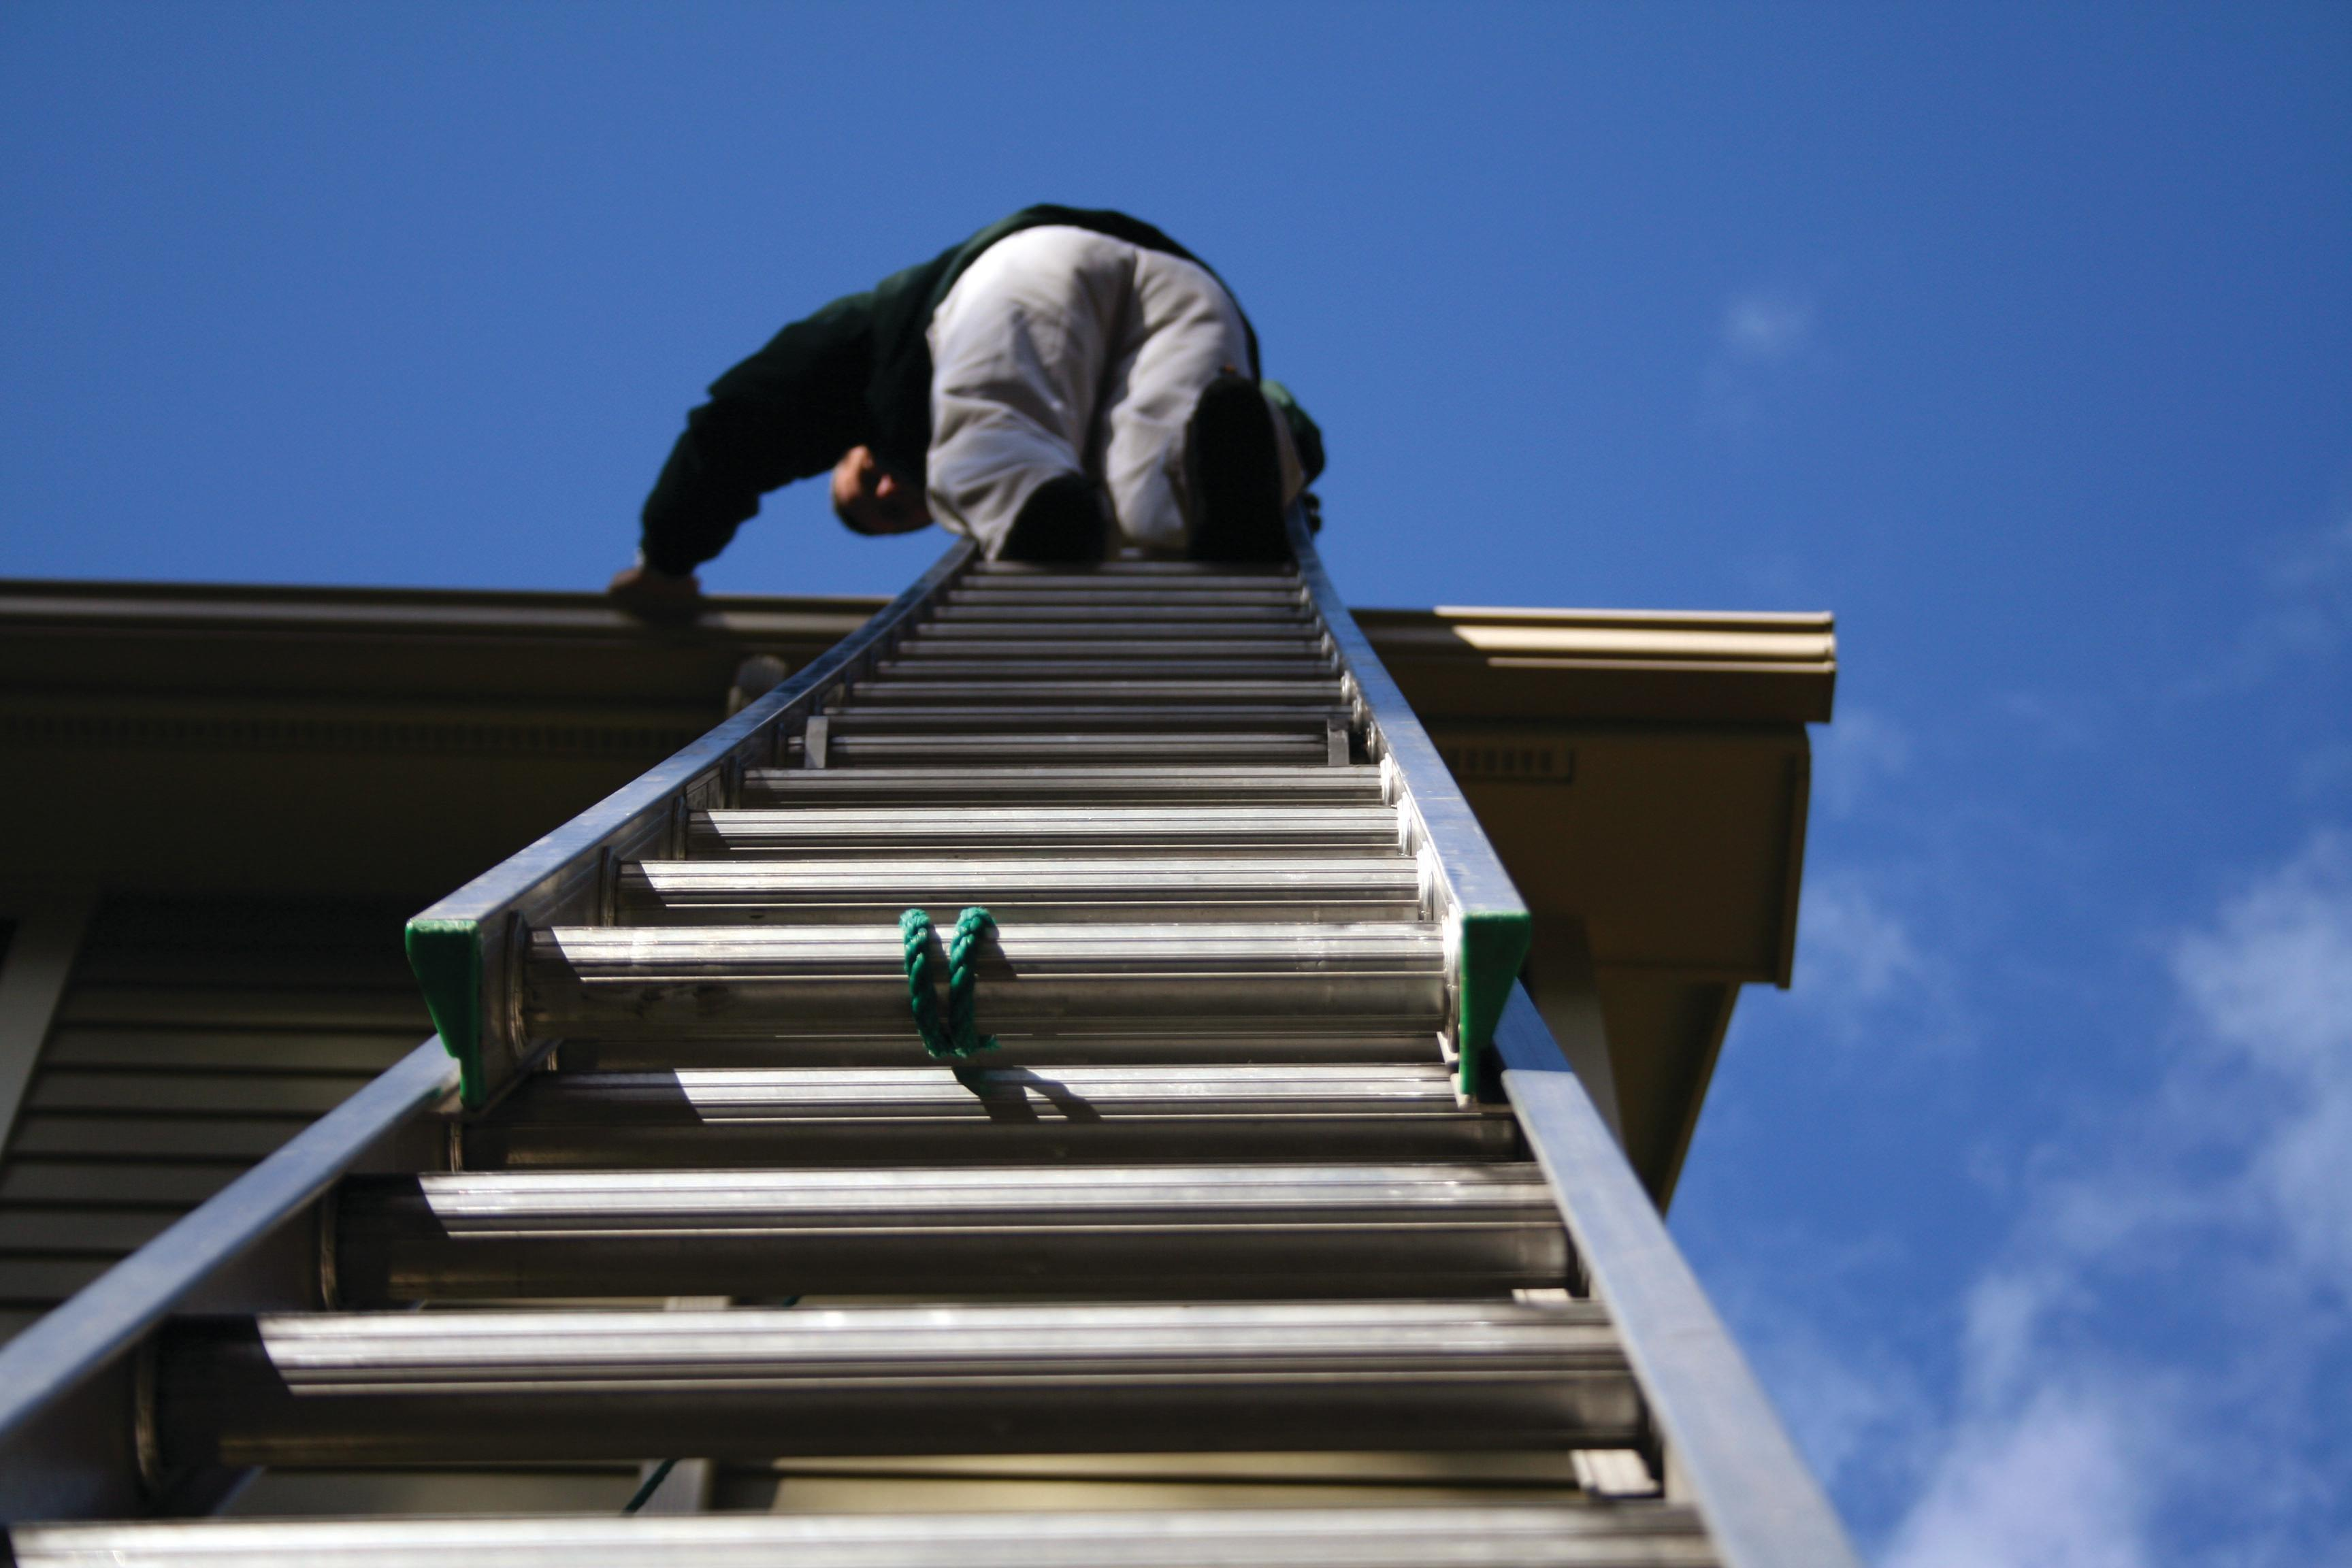 Lask Roofing Amp Siding Inc Rockford Illinois Il